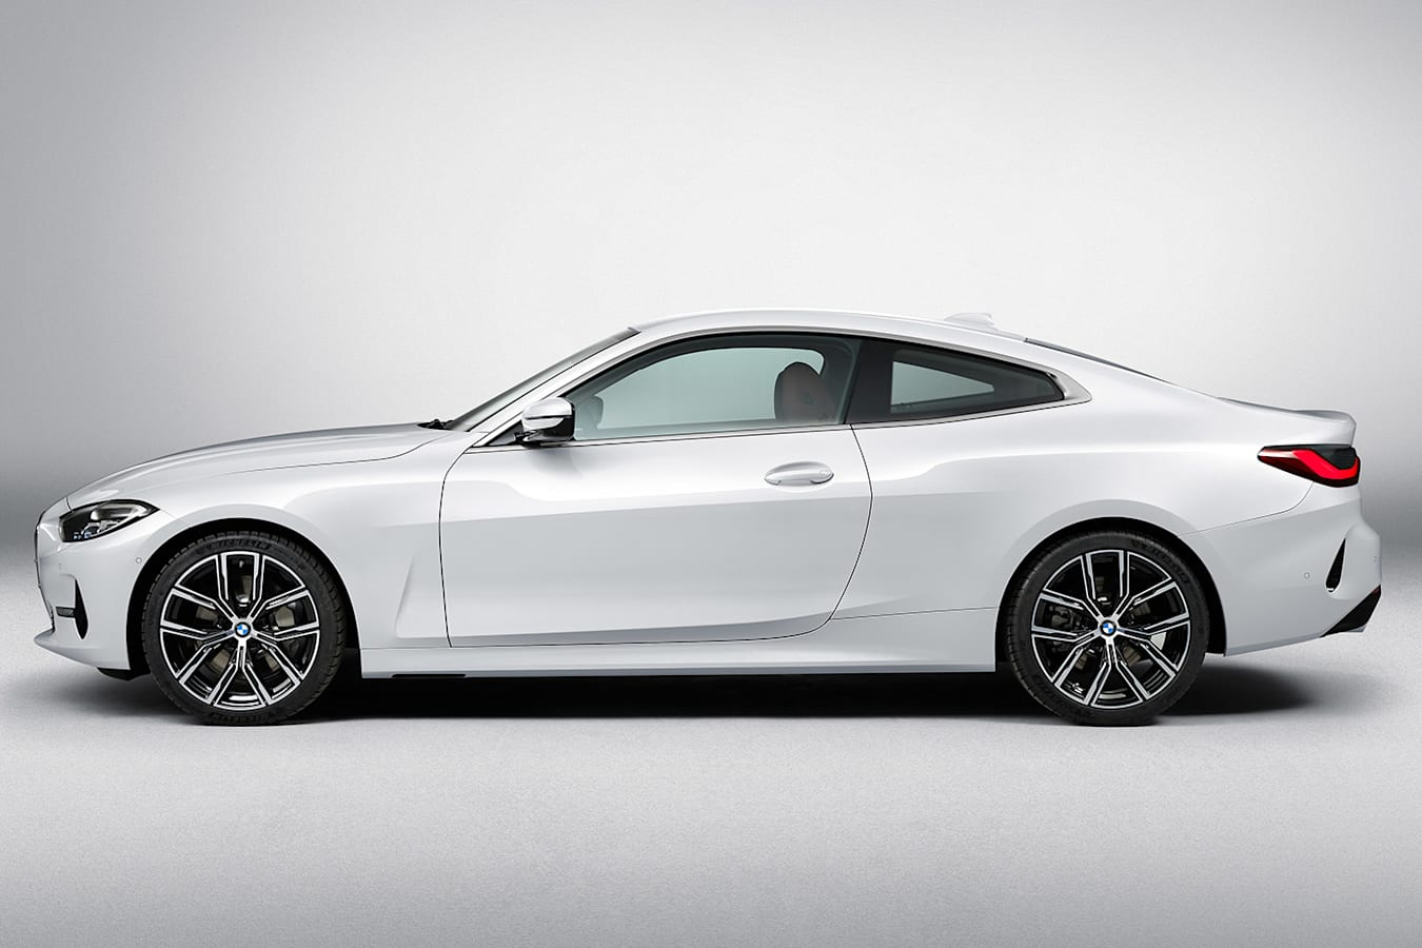 BMW 4 series side